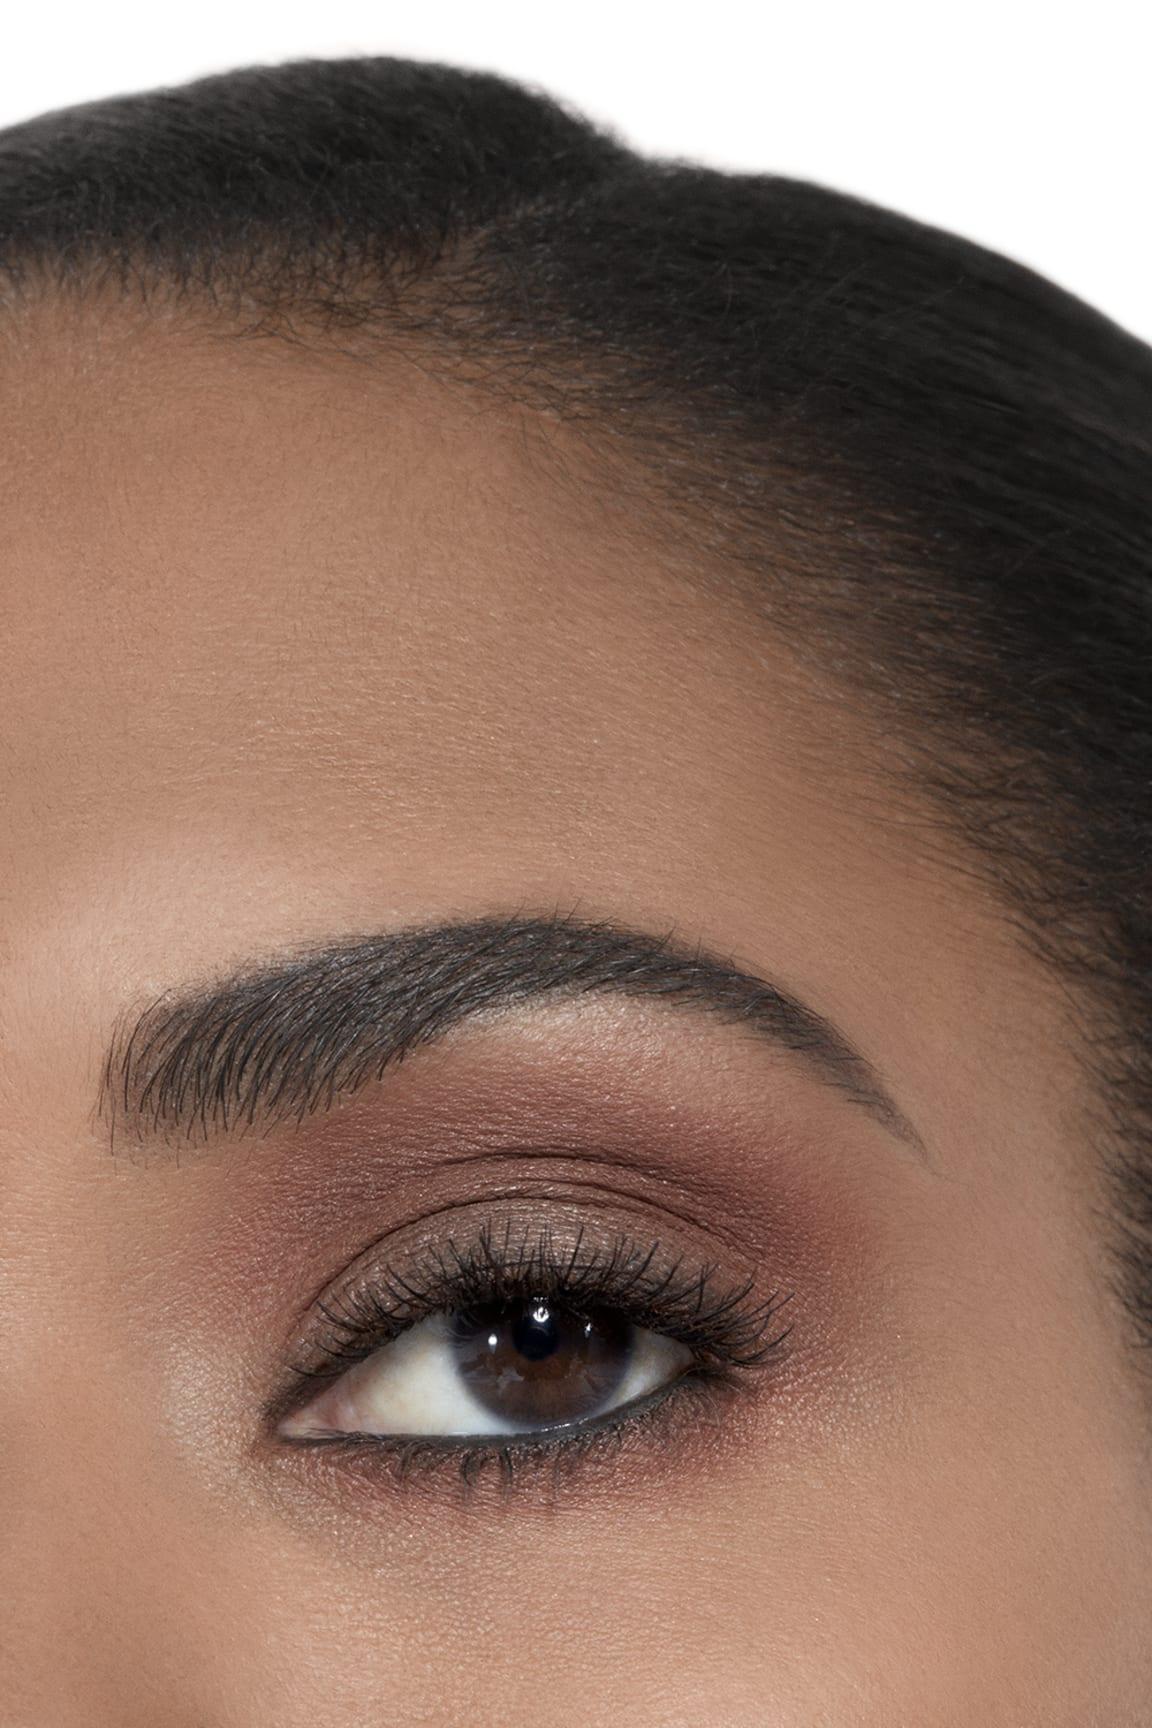 Anwendung Make-up-Bild 2 - LES 4 OMBRES 268 - CANDEUR ET EXPÉRIENCE